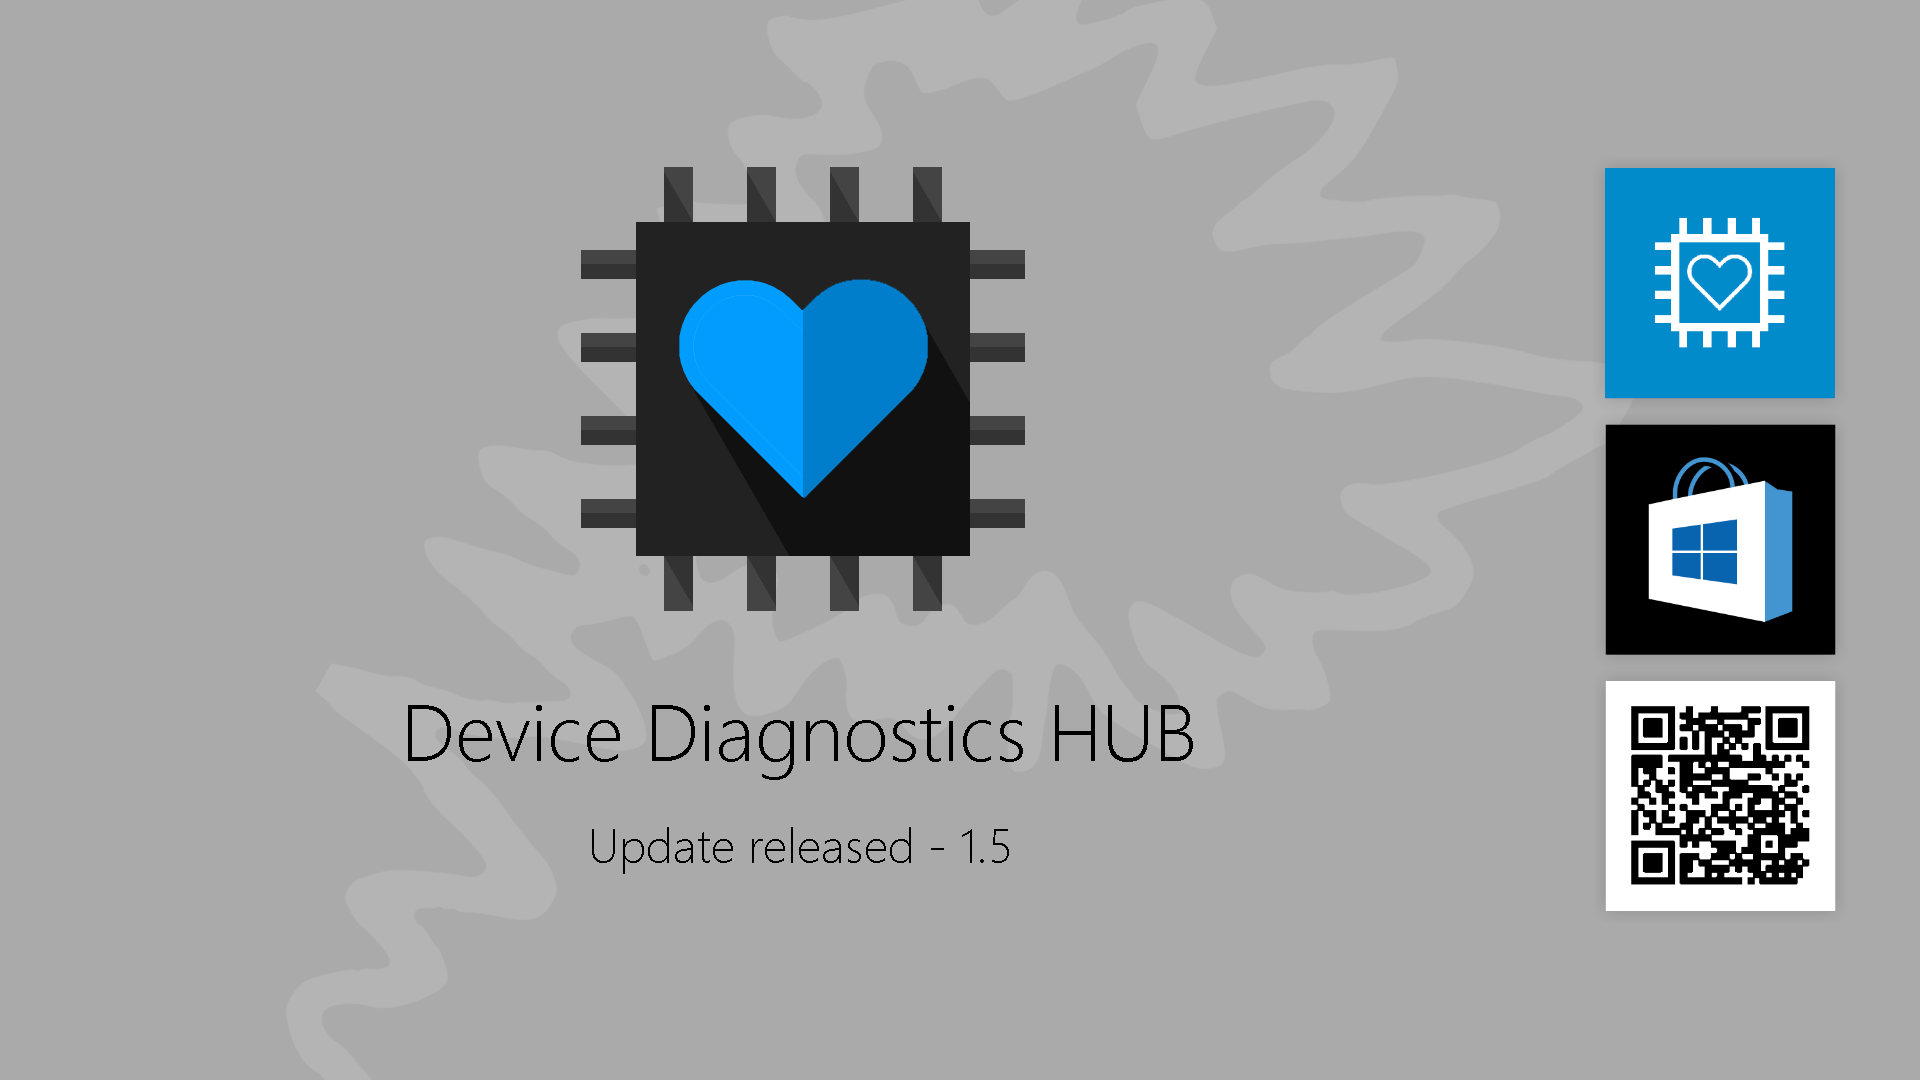 Device Diagnostics HUB